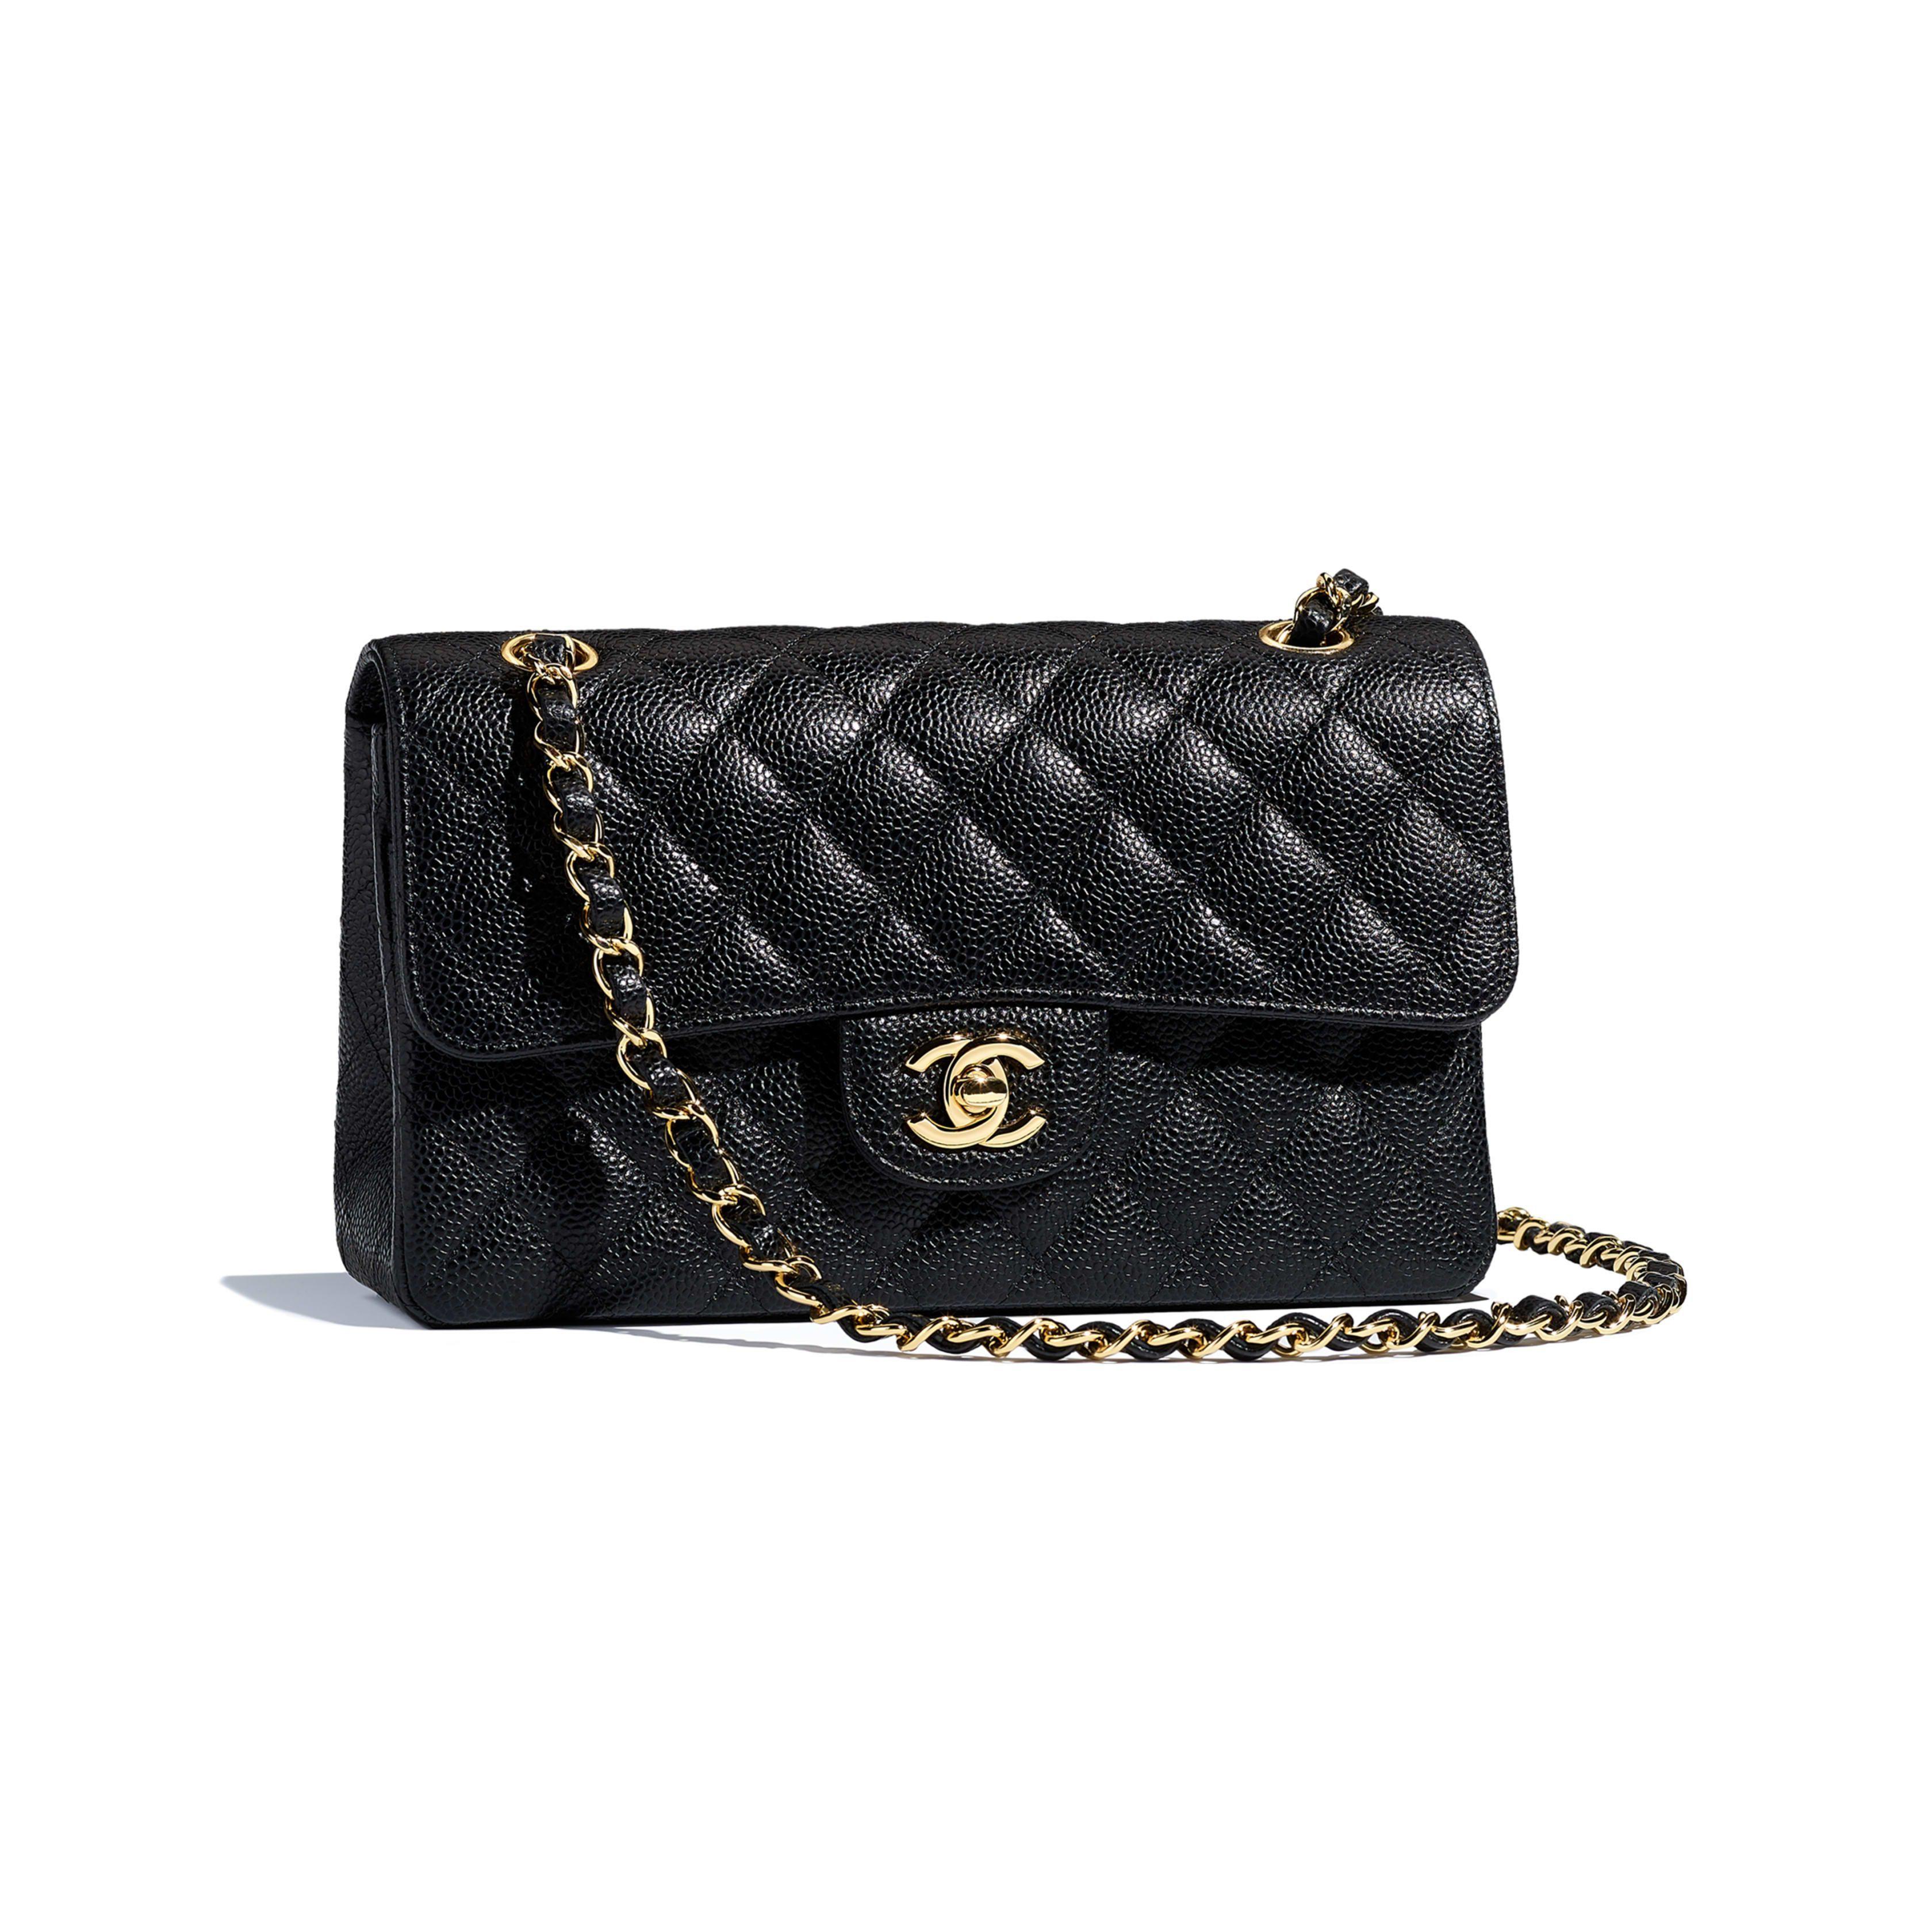 fbf1918271eb Chanel Small Classic Handbag Grained Calfskin & Gold-Tone Metal Black